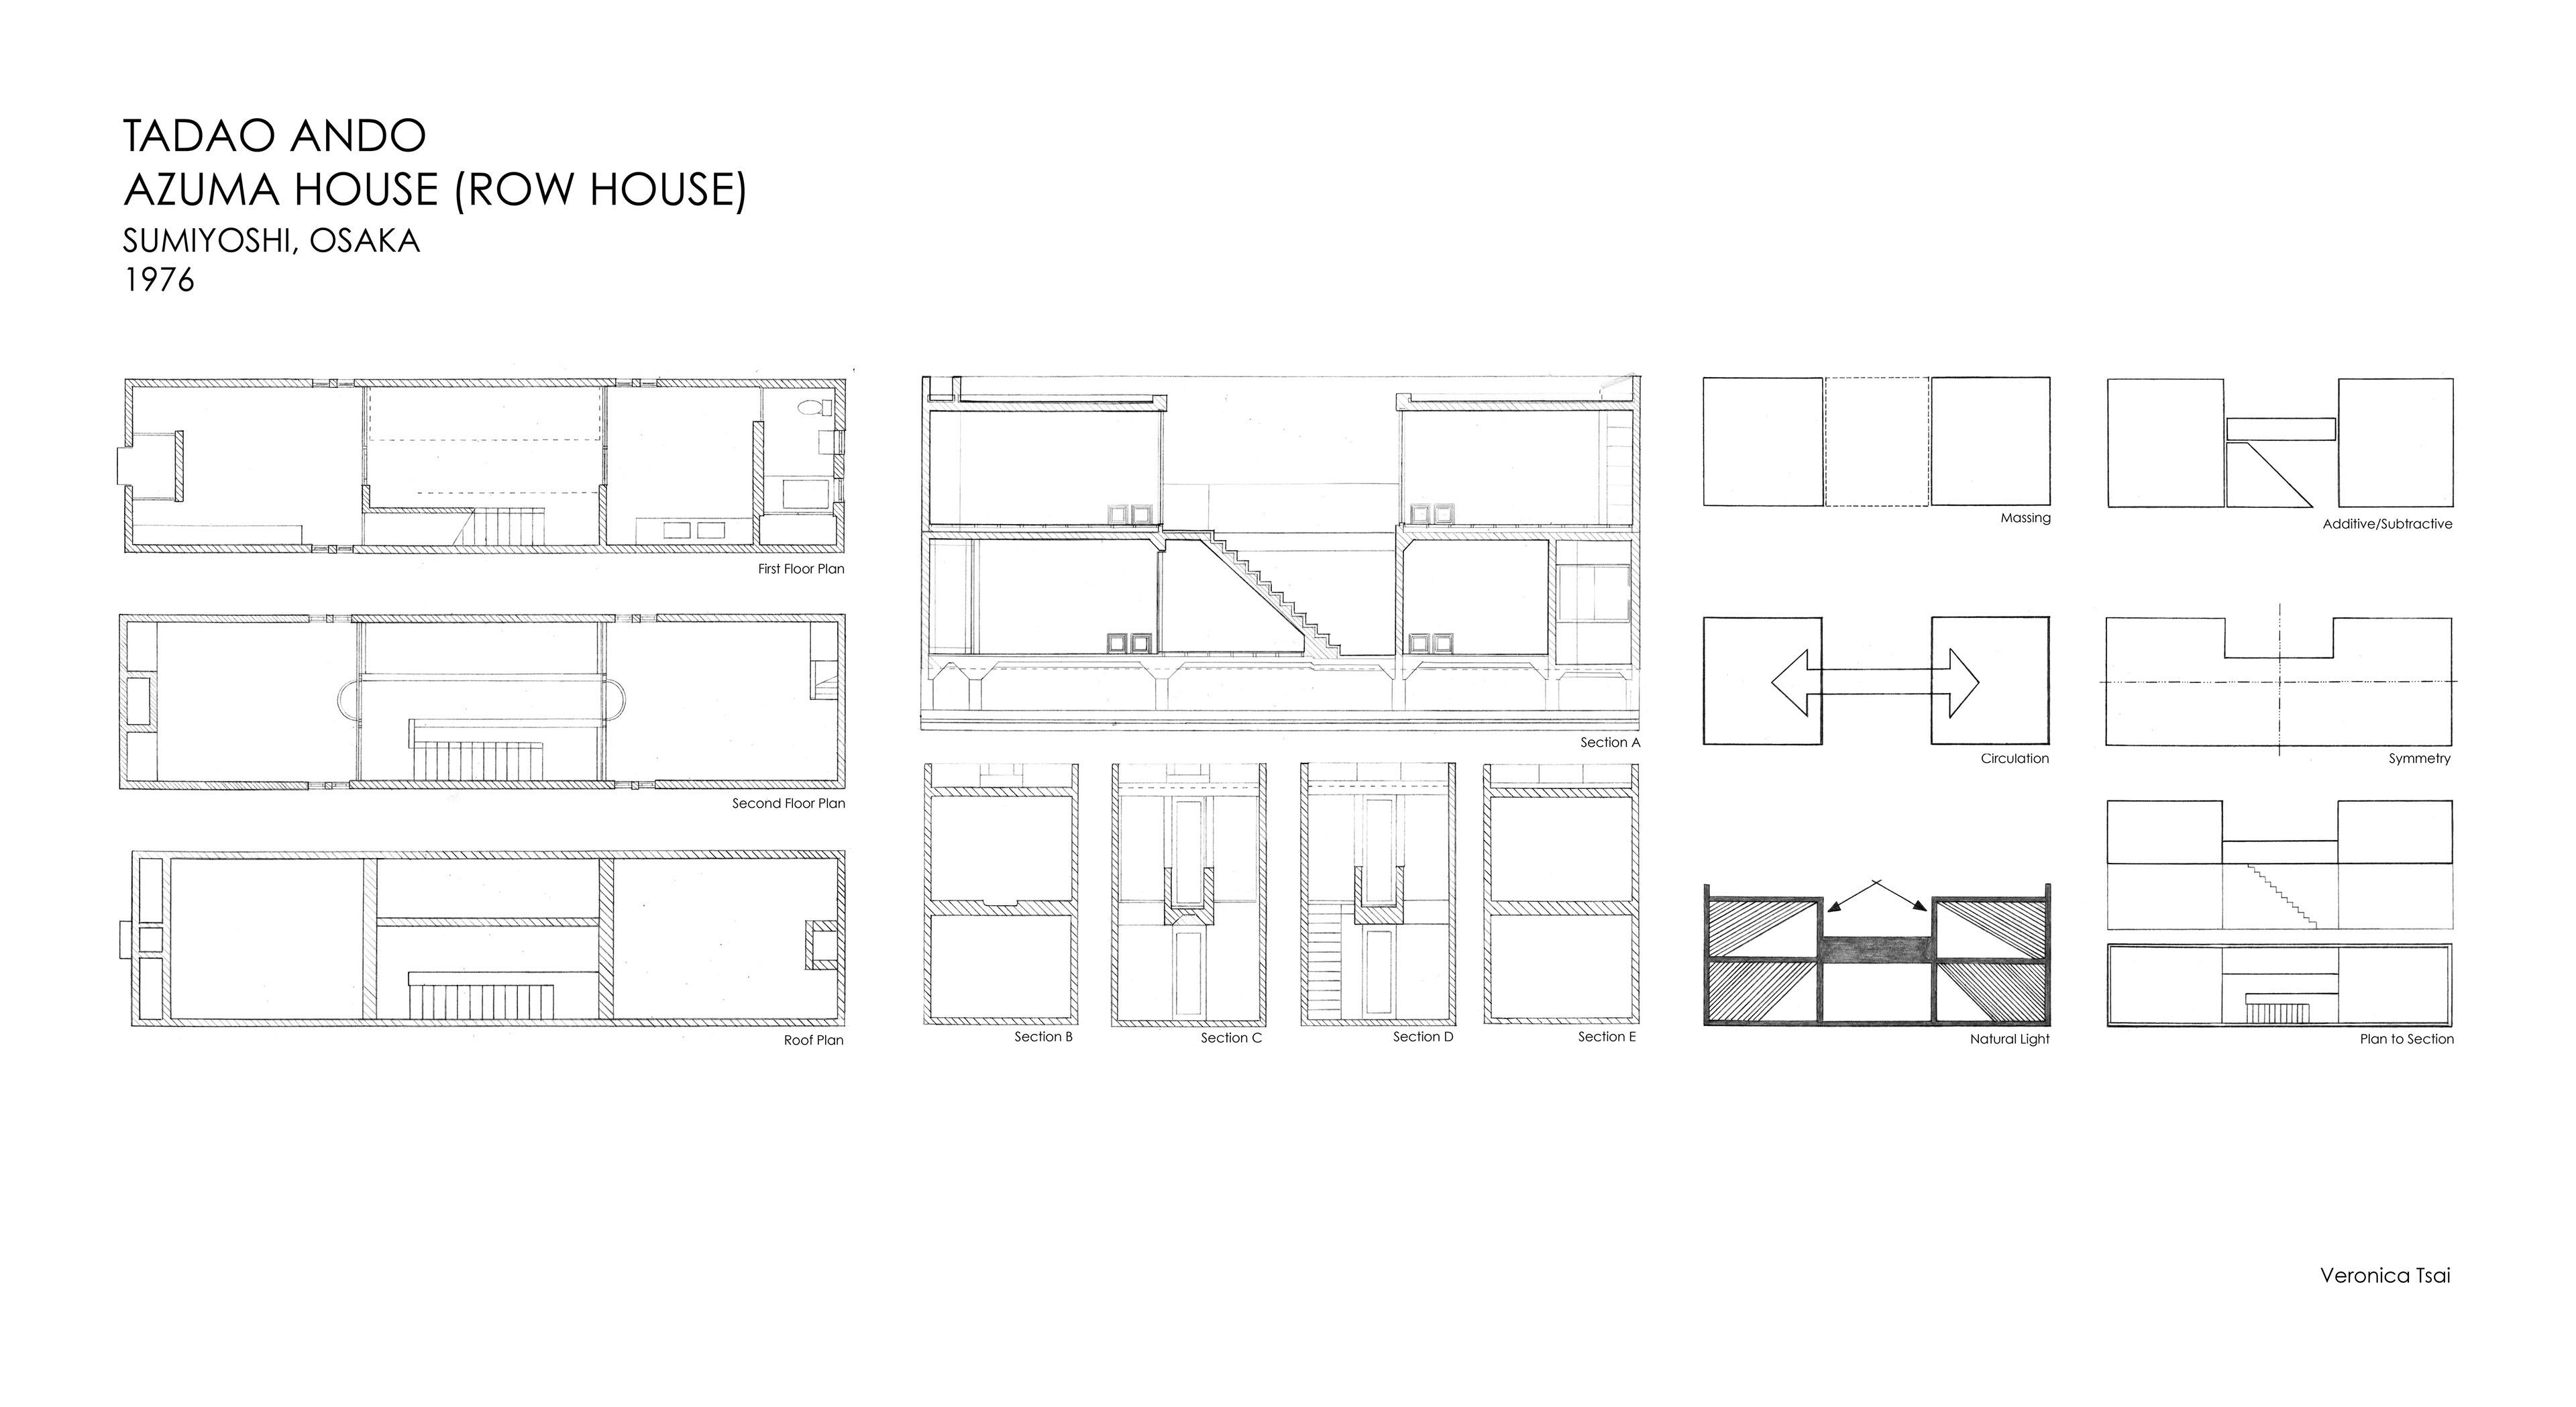 Photo azuma house plan images tadao ando azuma house for Row house dimensions